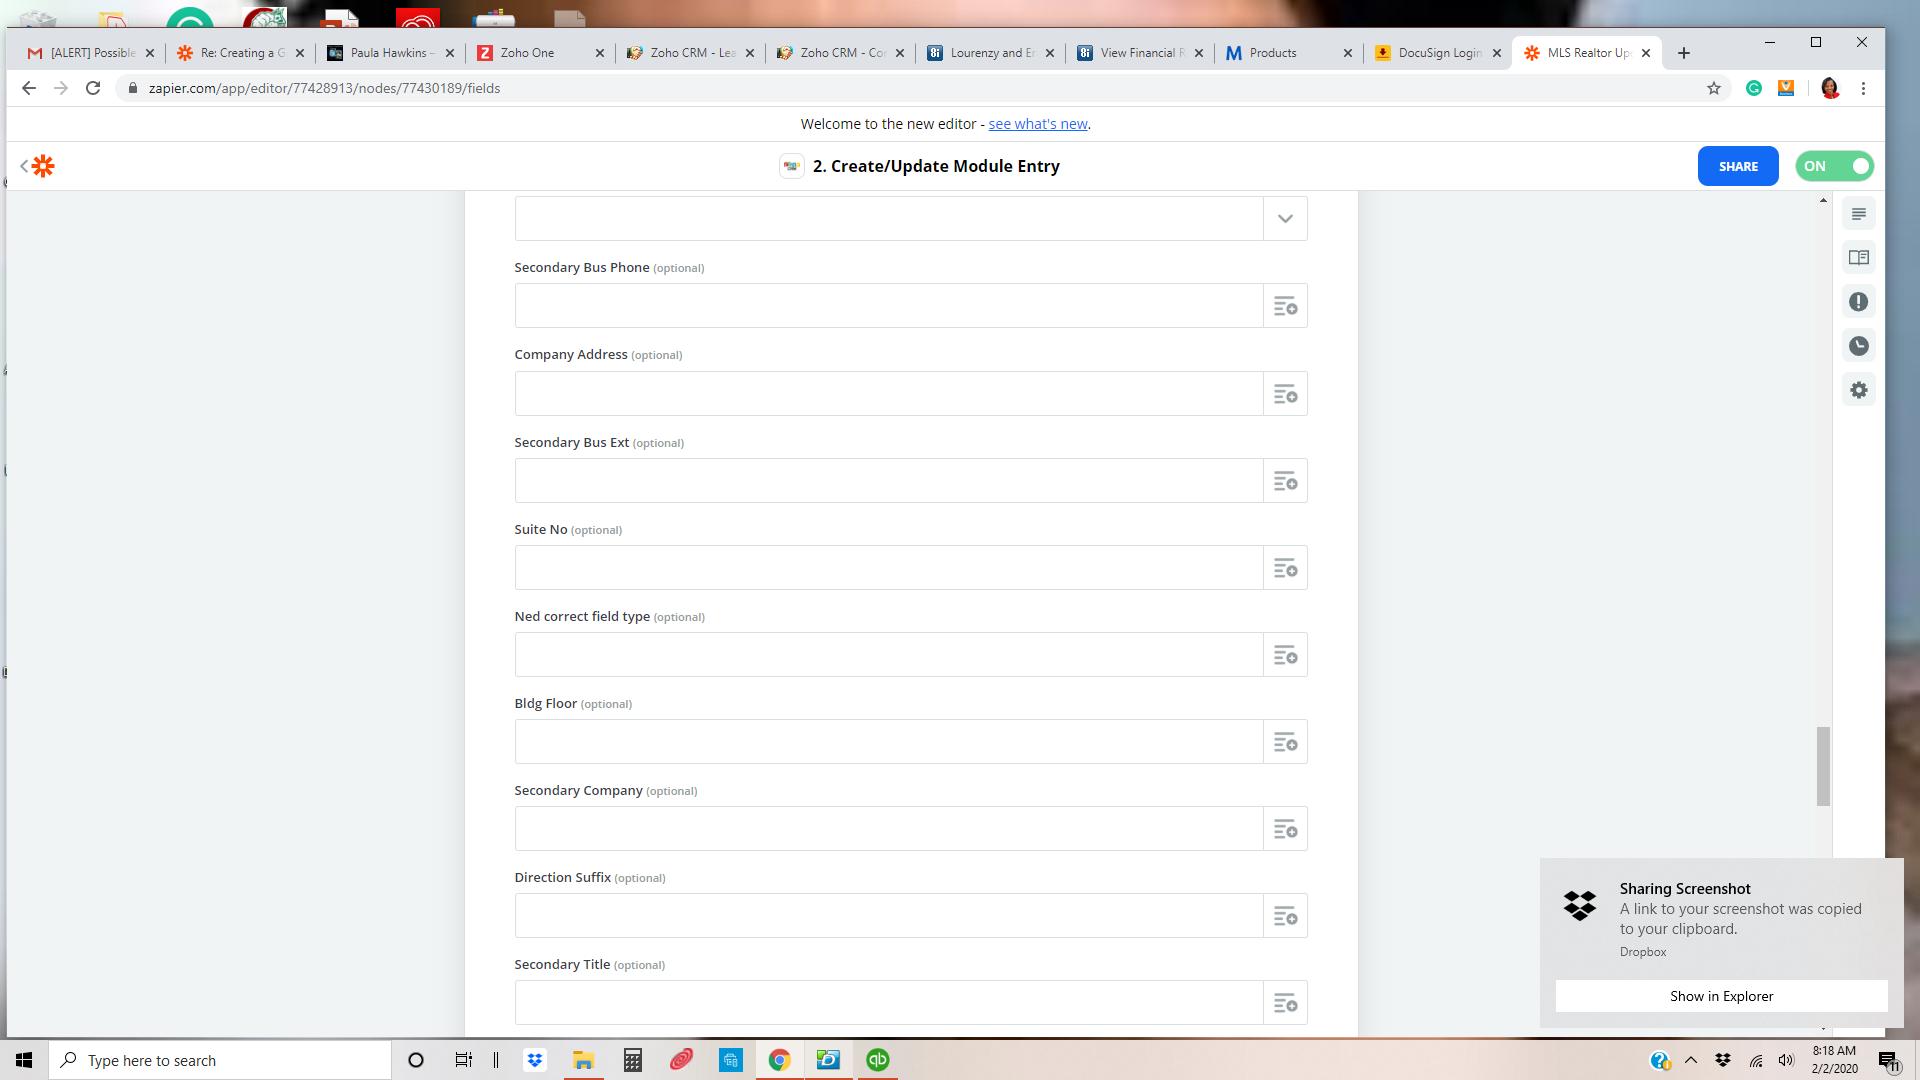 Screenshot 2020-02-02 08.18.41.png